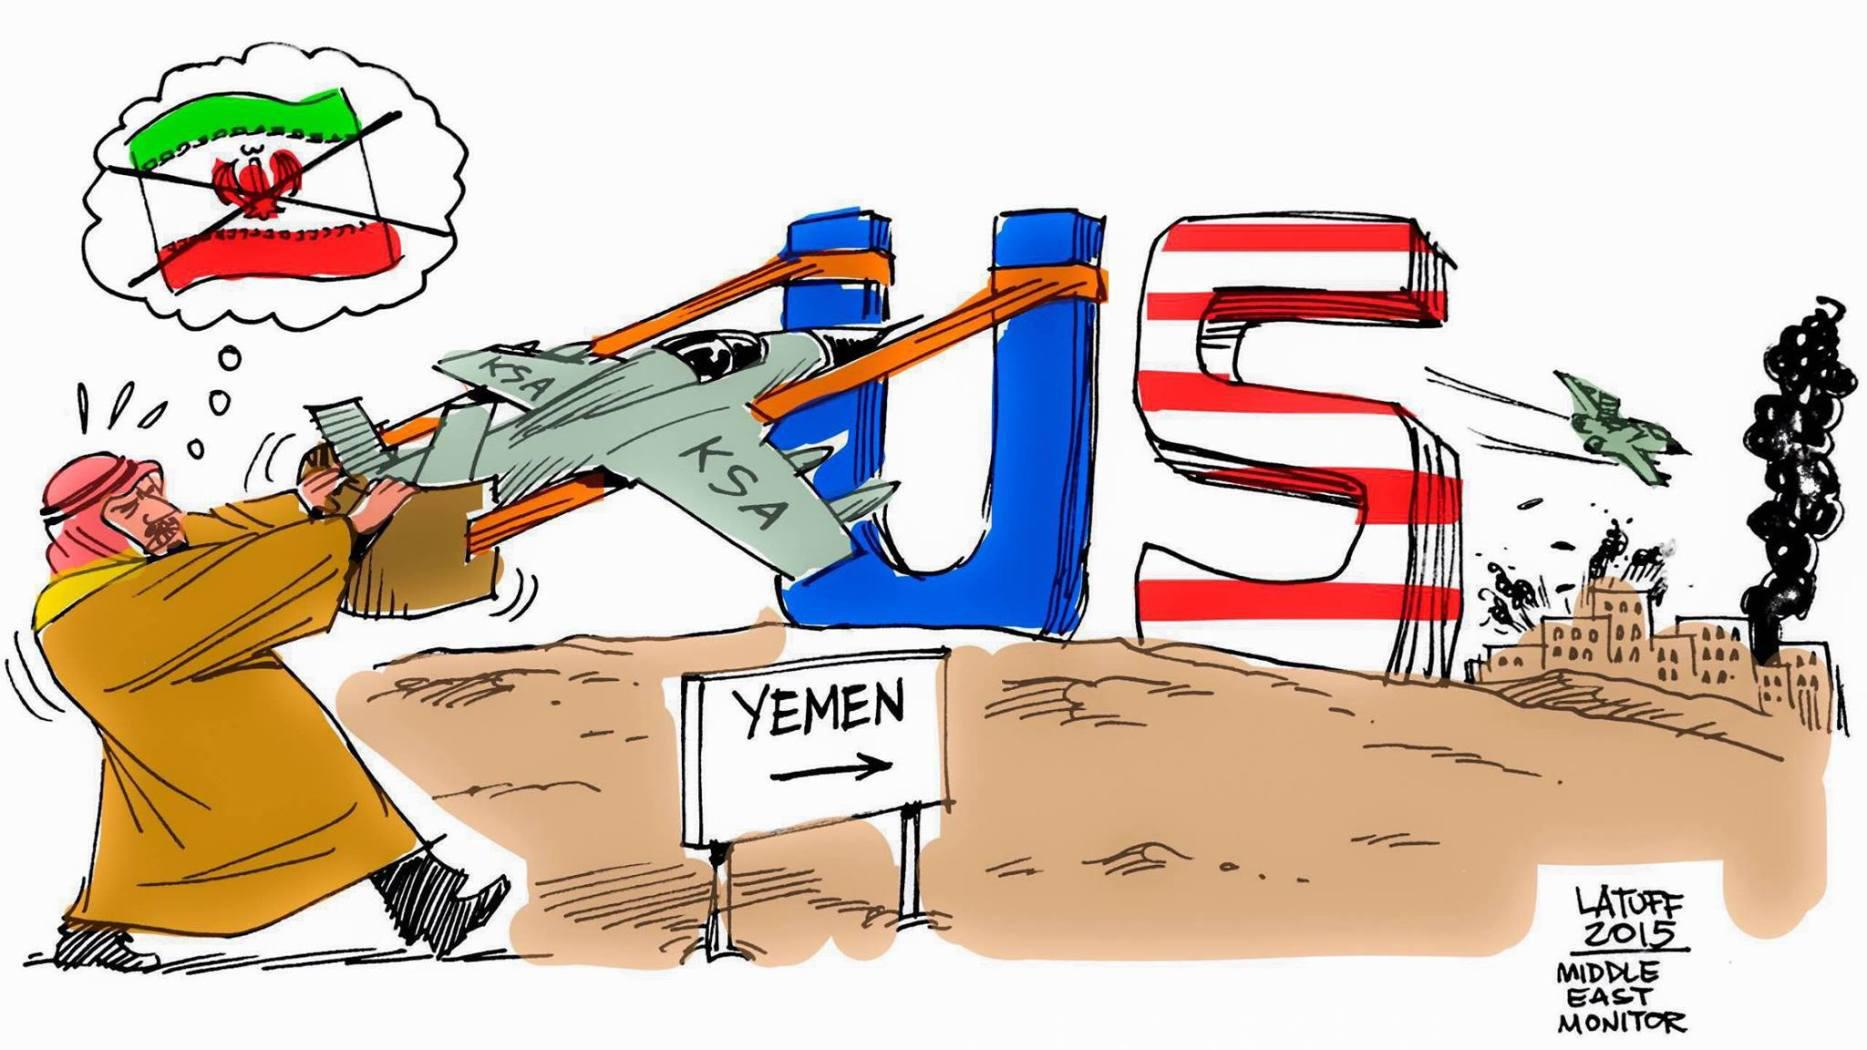 Read Clashes Erupt In Yemen's Aden, One Dead Online